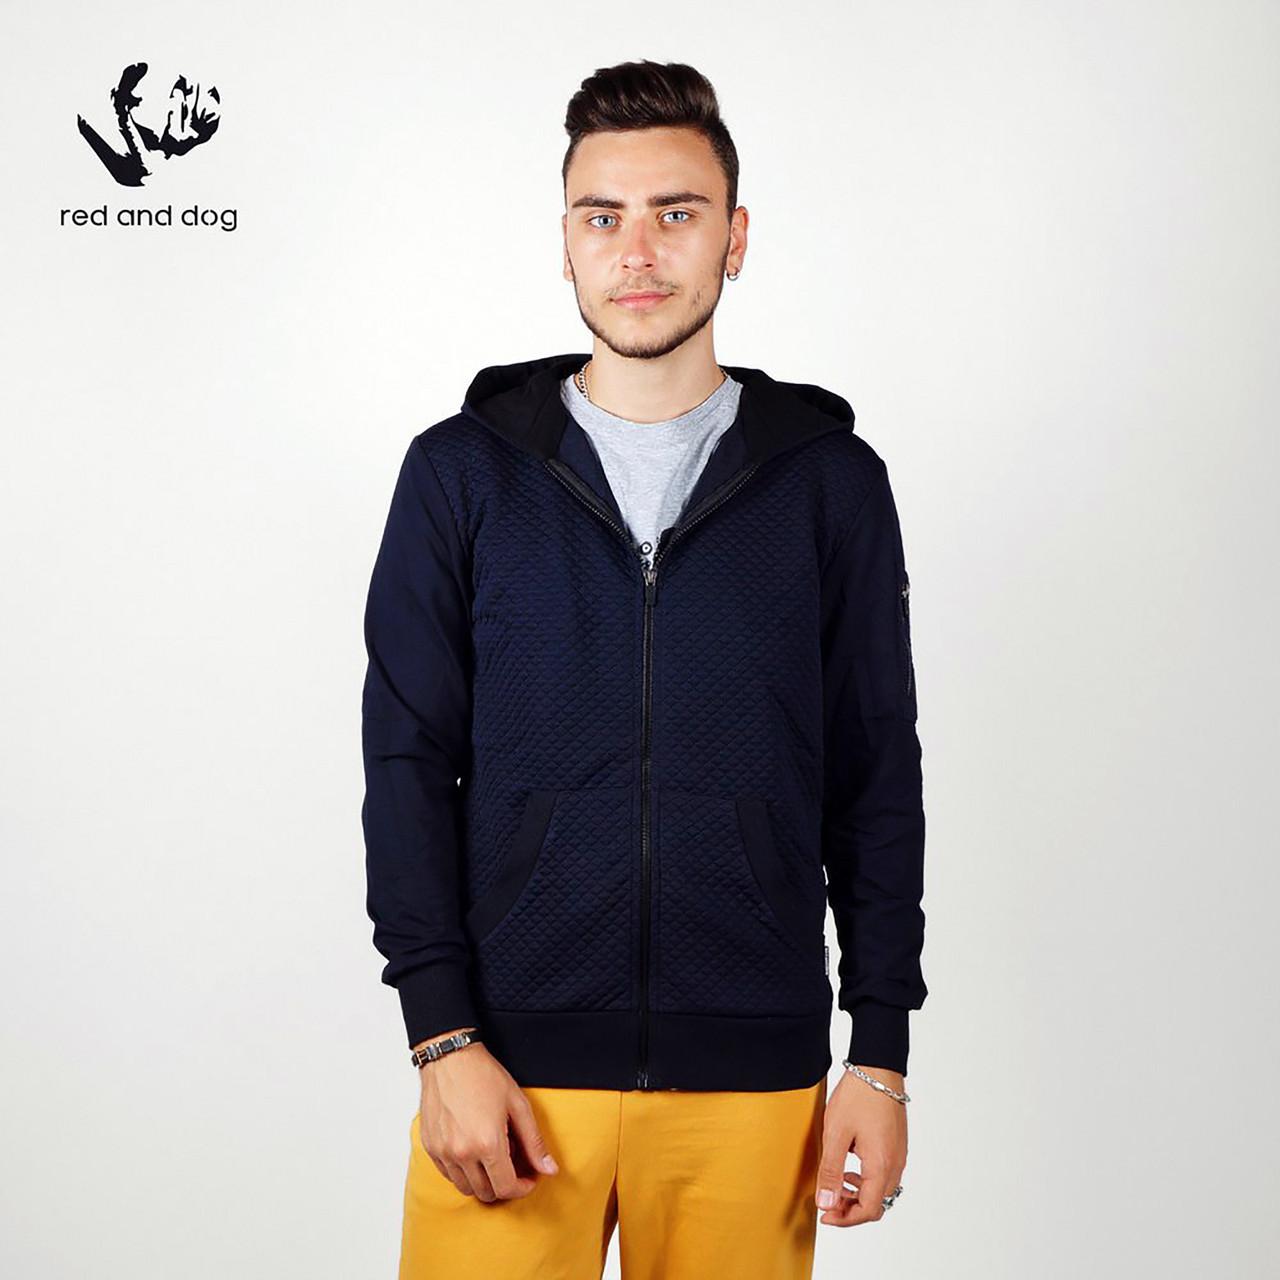 Зиппер мужской RaD Hound темно-синее XL